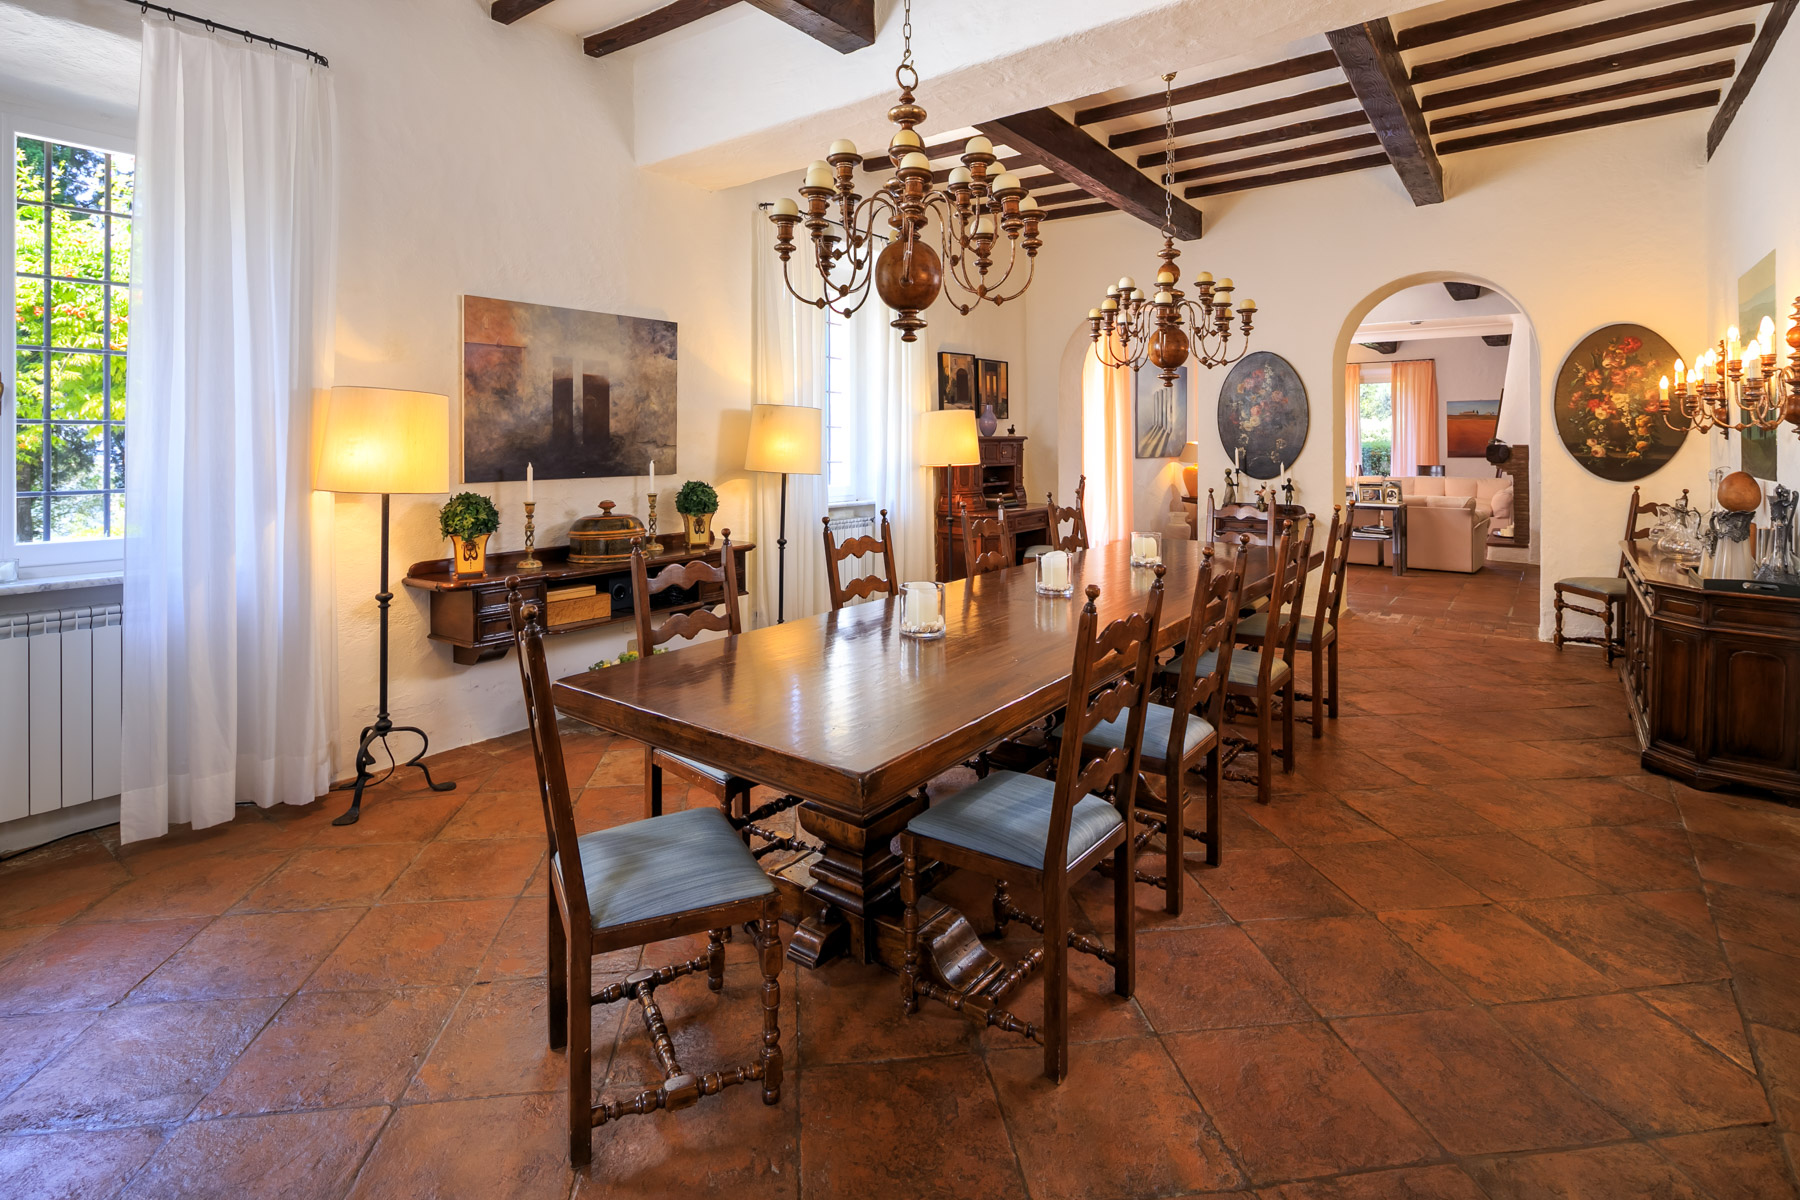 Villa in Vendita a Campiglia Marittima: 5 locali, 1100 mq - Foto 28